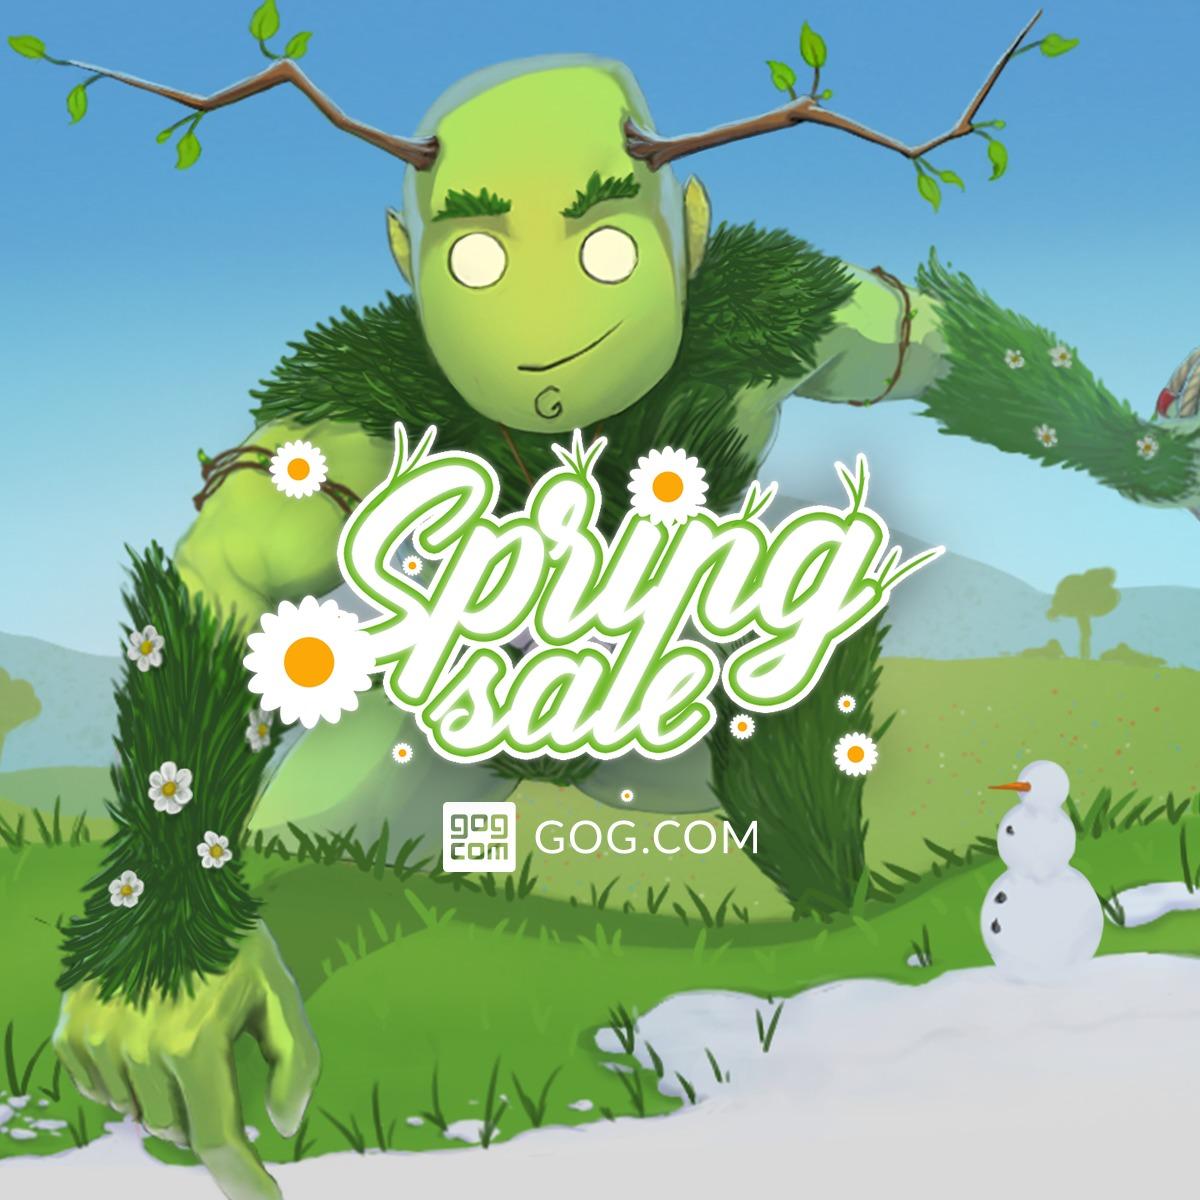 Wiosenna promocja na GOGu!